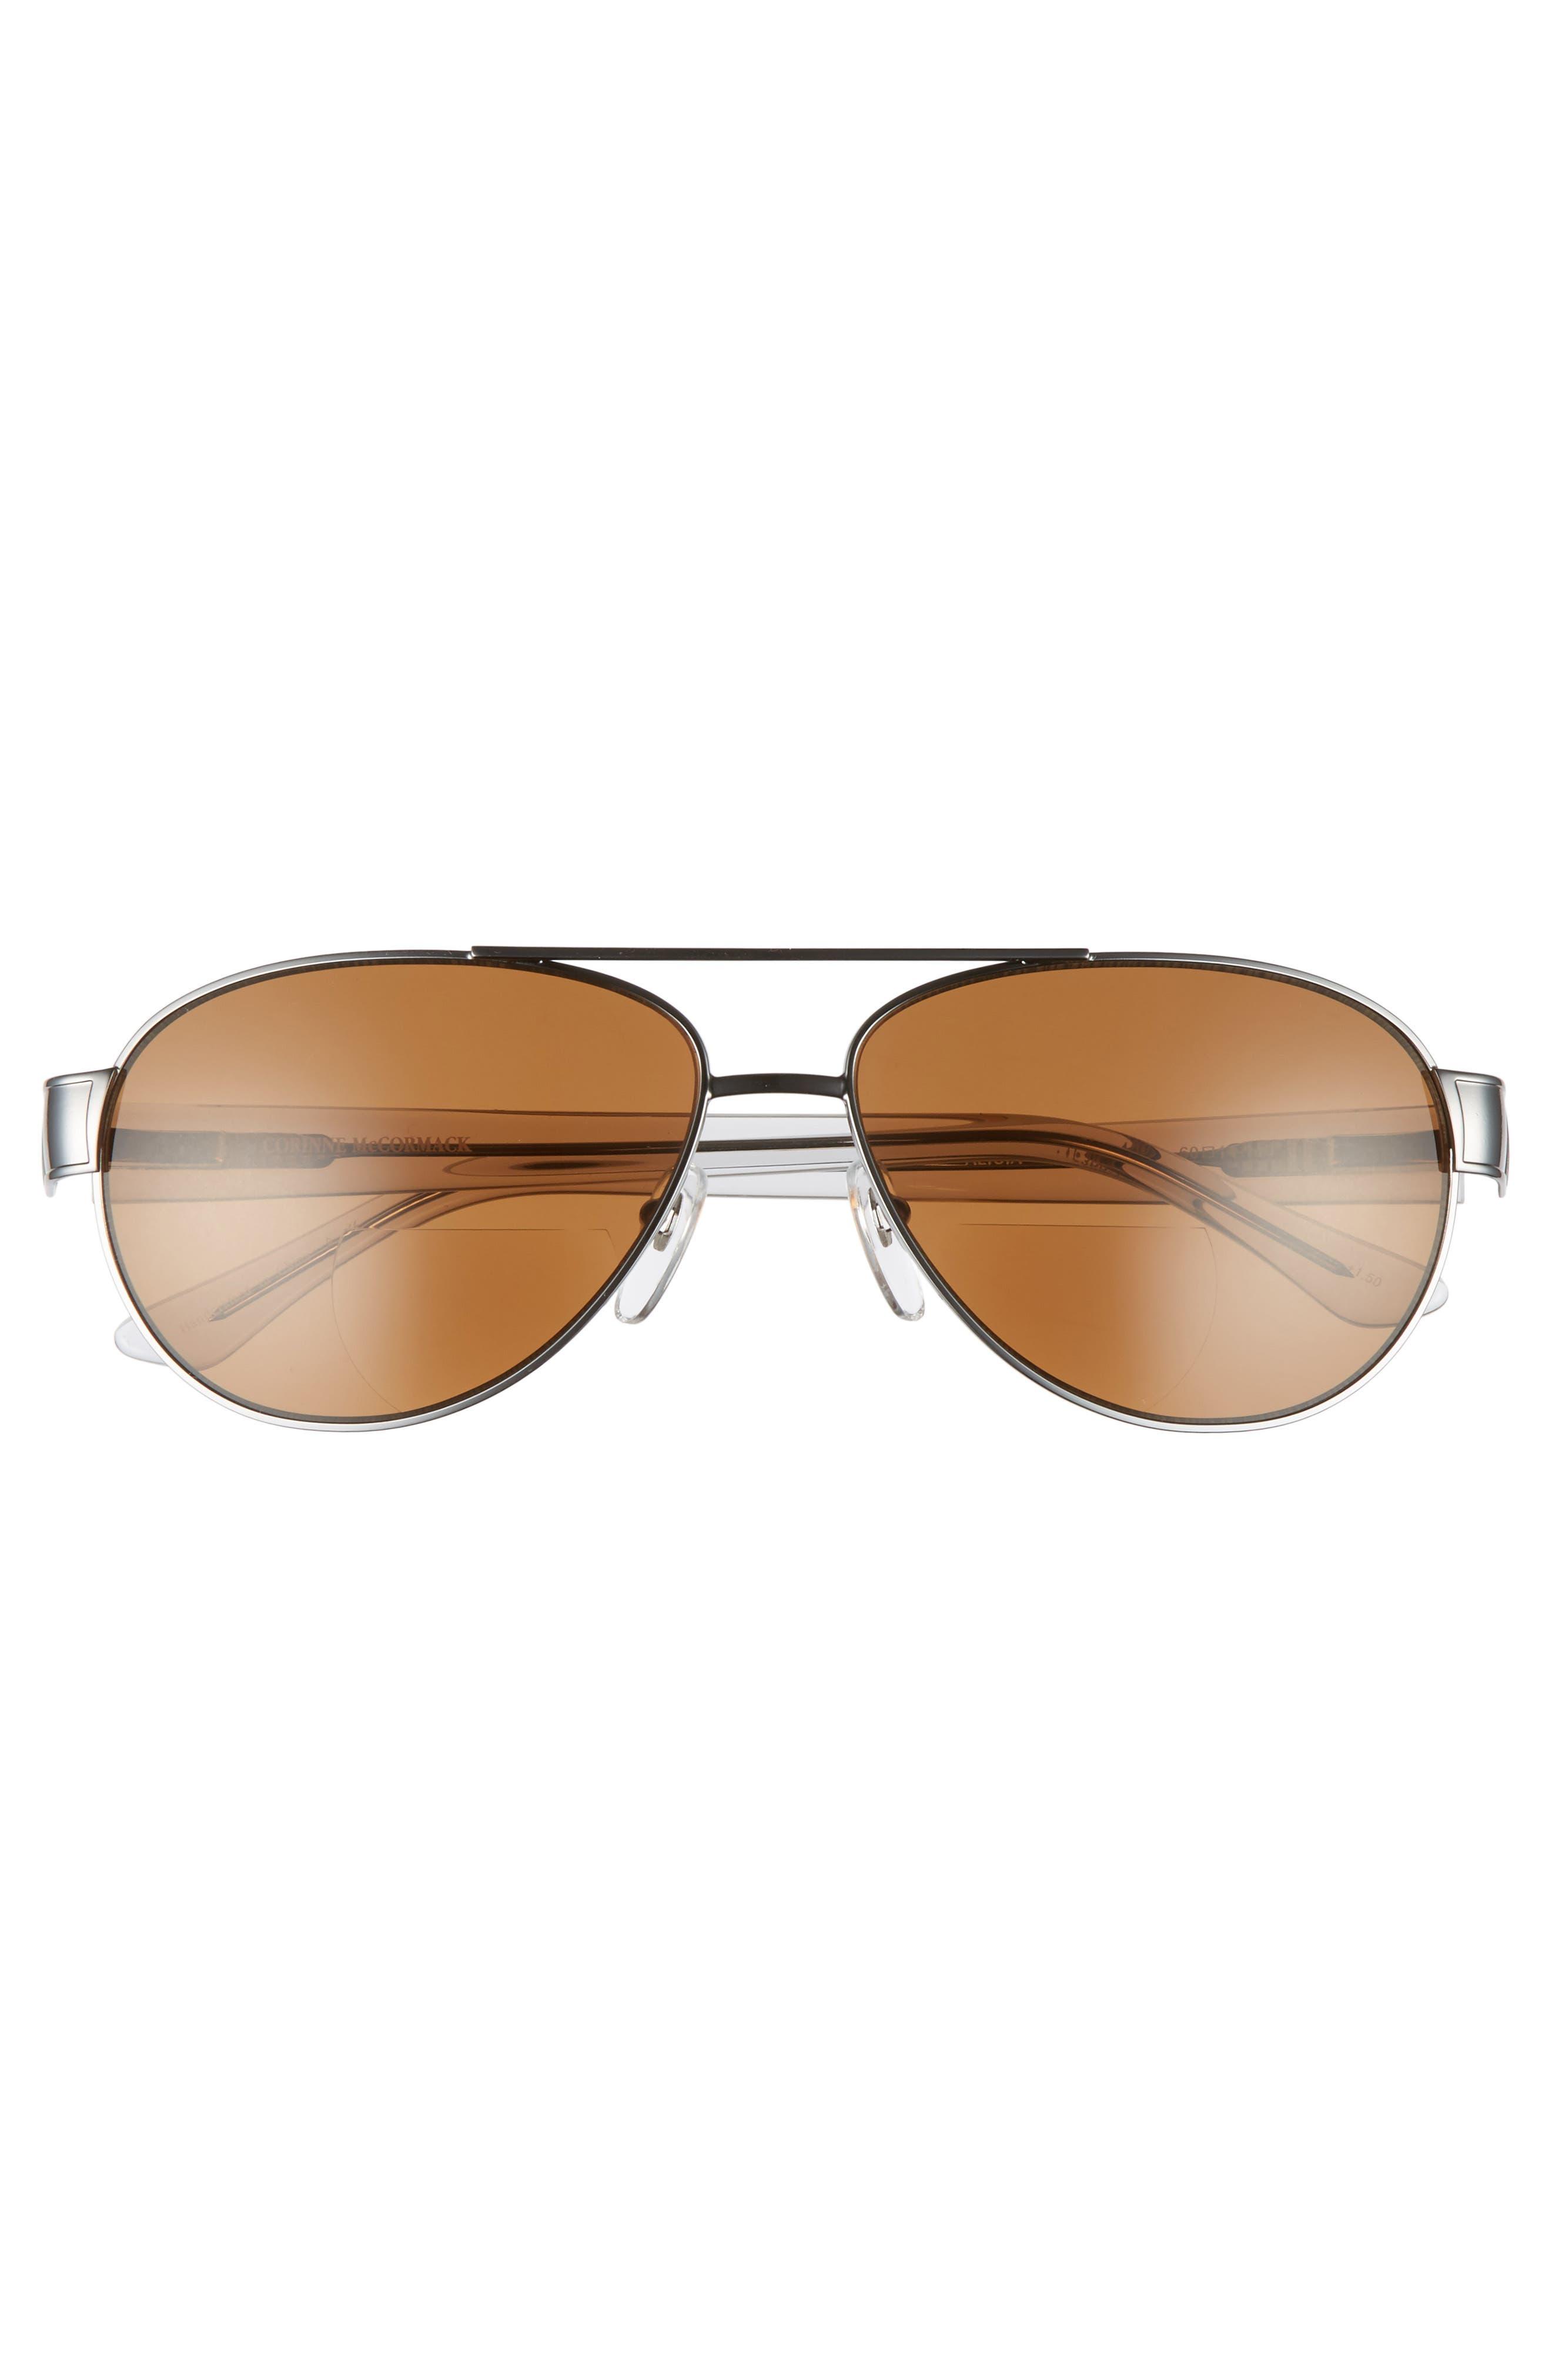 Alicia 60mm Optical Sunglasses,                             Alternate thumbnail 3, color,                             020